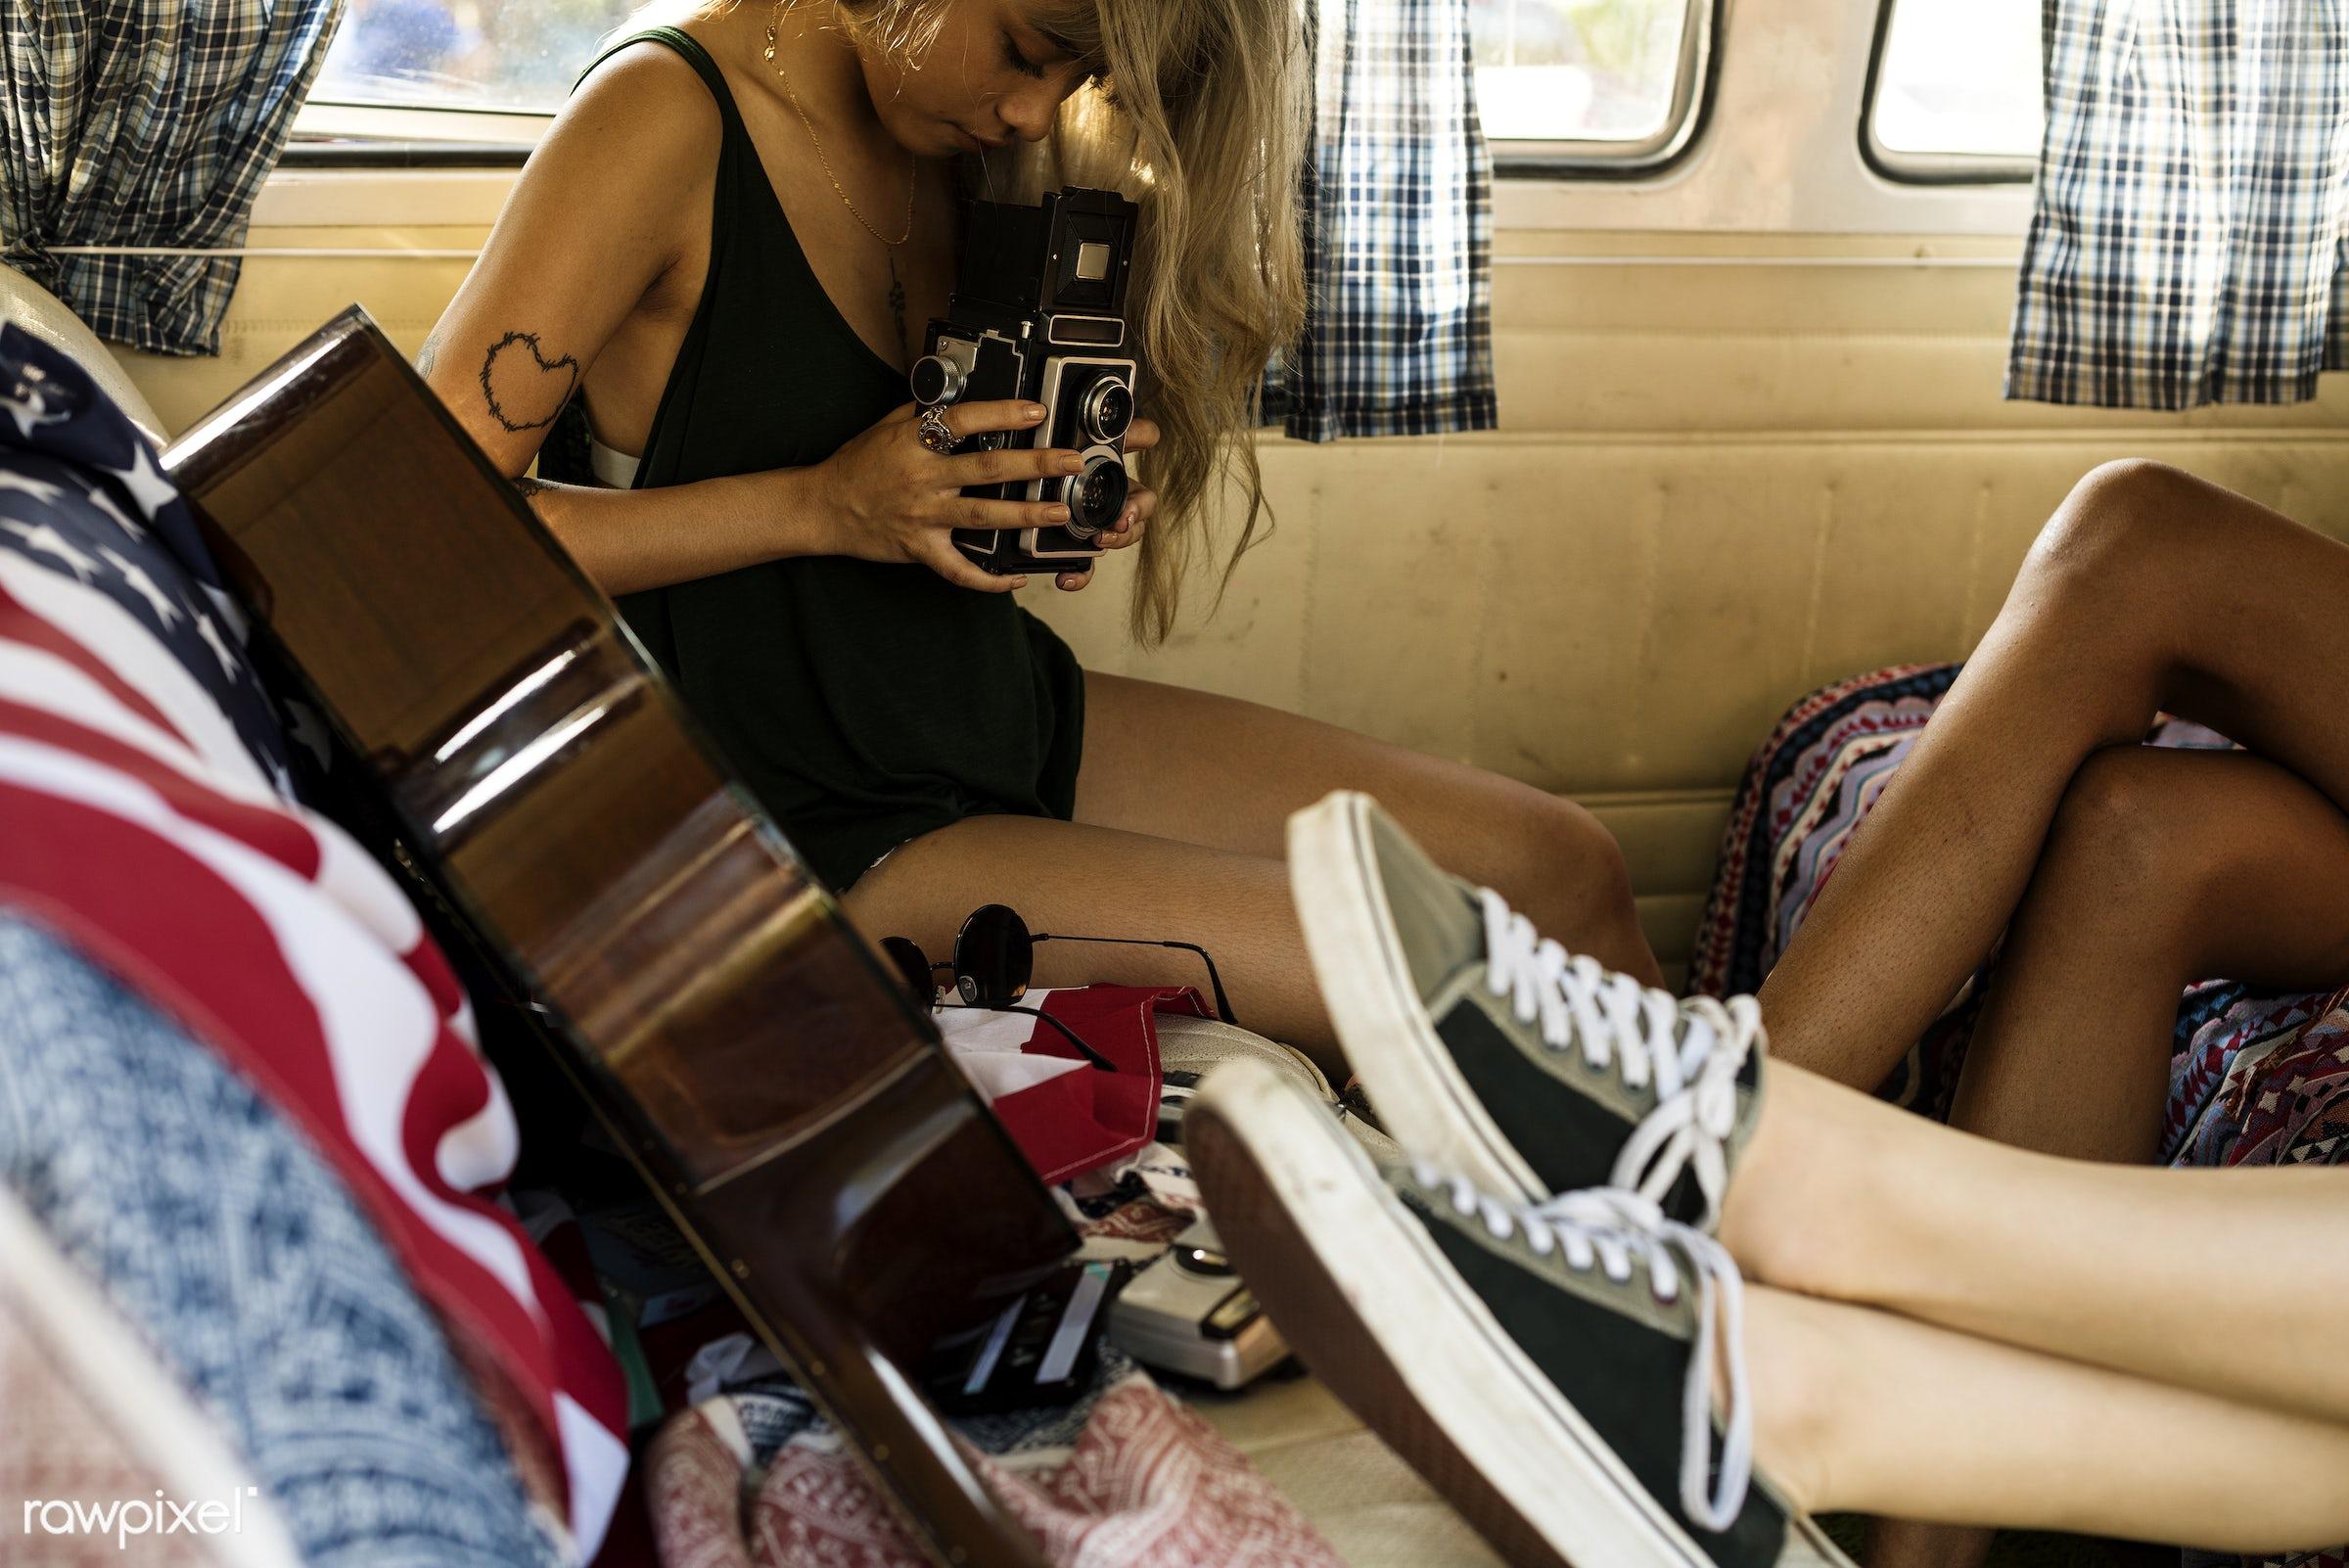 adult, adventure, america, american, american flag, attractive, beauty, camera, car, female, flag, guitar, gypsy, hippy,...